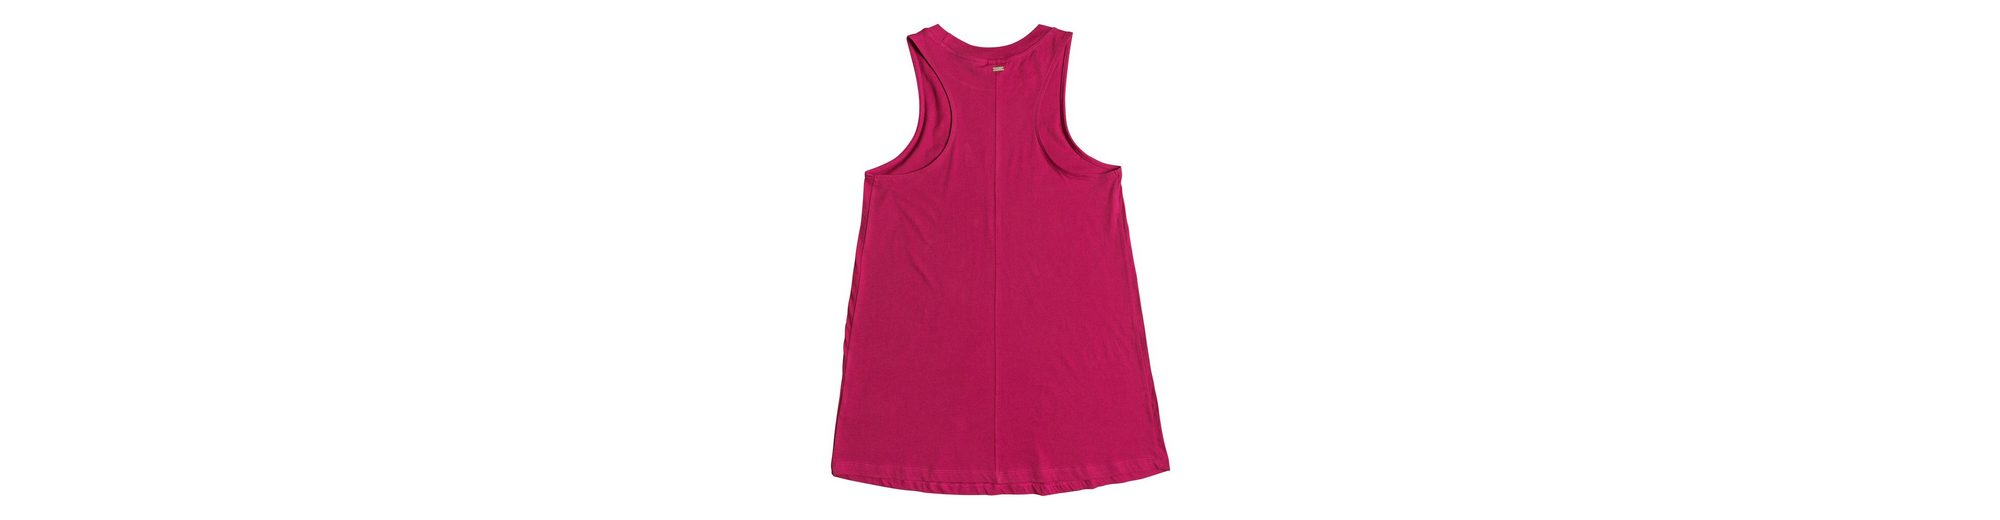 Roxy Ärmelloses T-Shirt Kleid ROXY Shiny Niedrig Preis Versandkosten Für Verkauf MU8Kadl